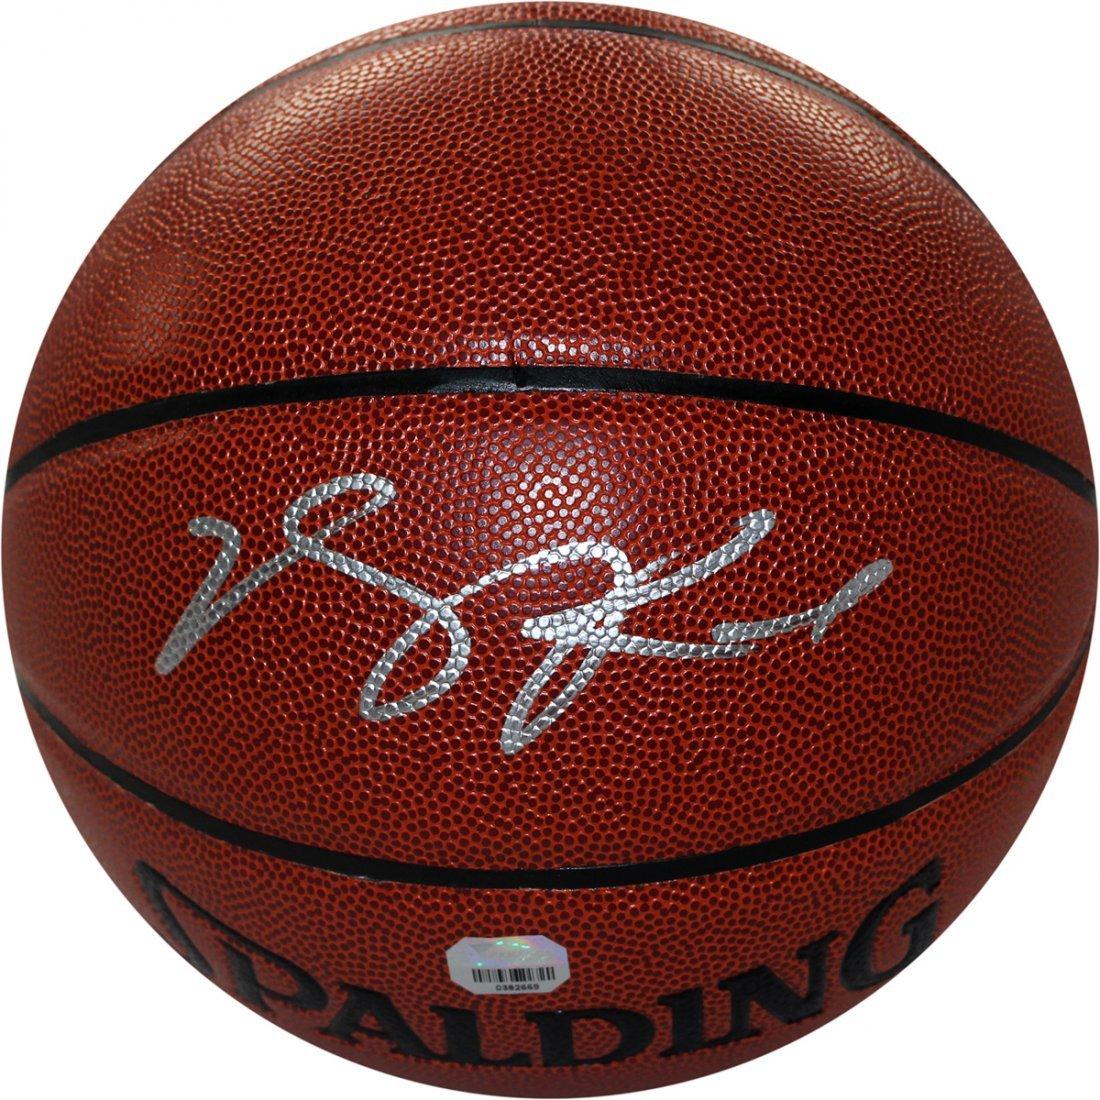 Derrick Rose Signed I/O Basketball (Fanatics Auth)